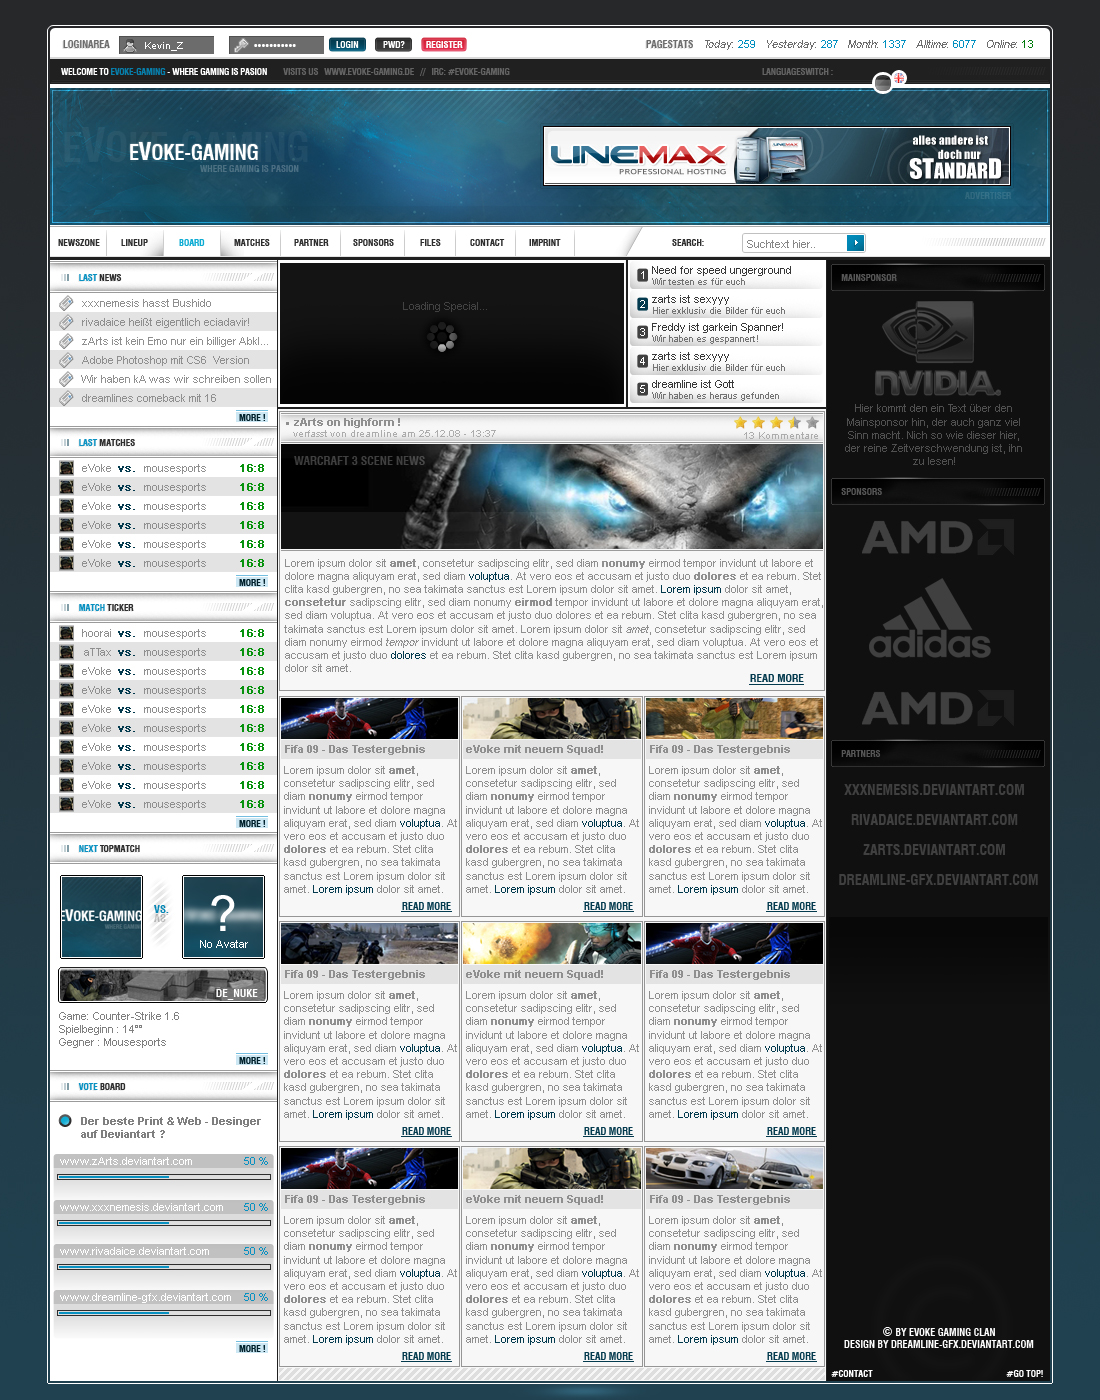 Clandesign III by dreamline-gfx